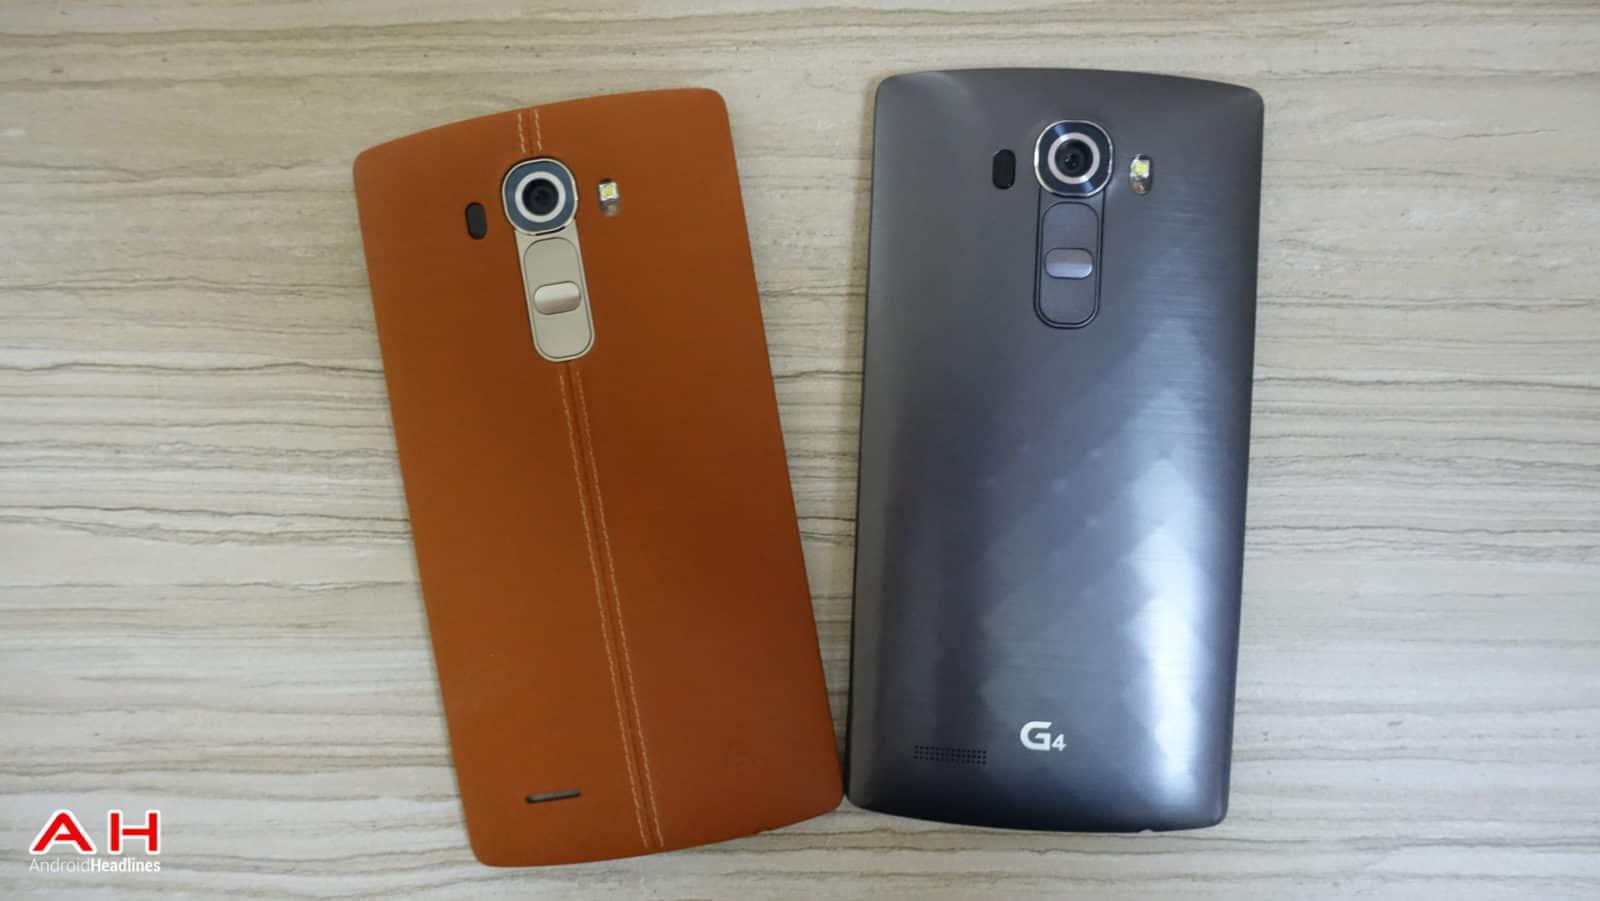 LG-G4-AH-8